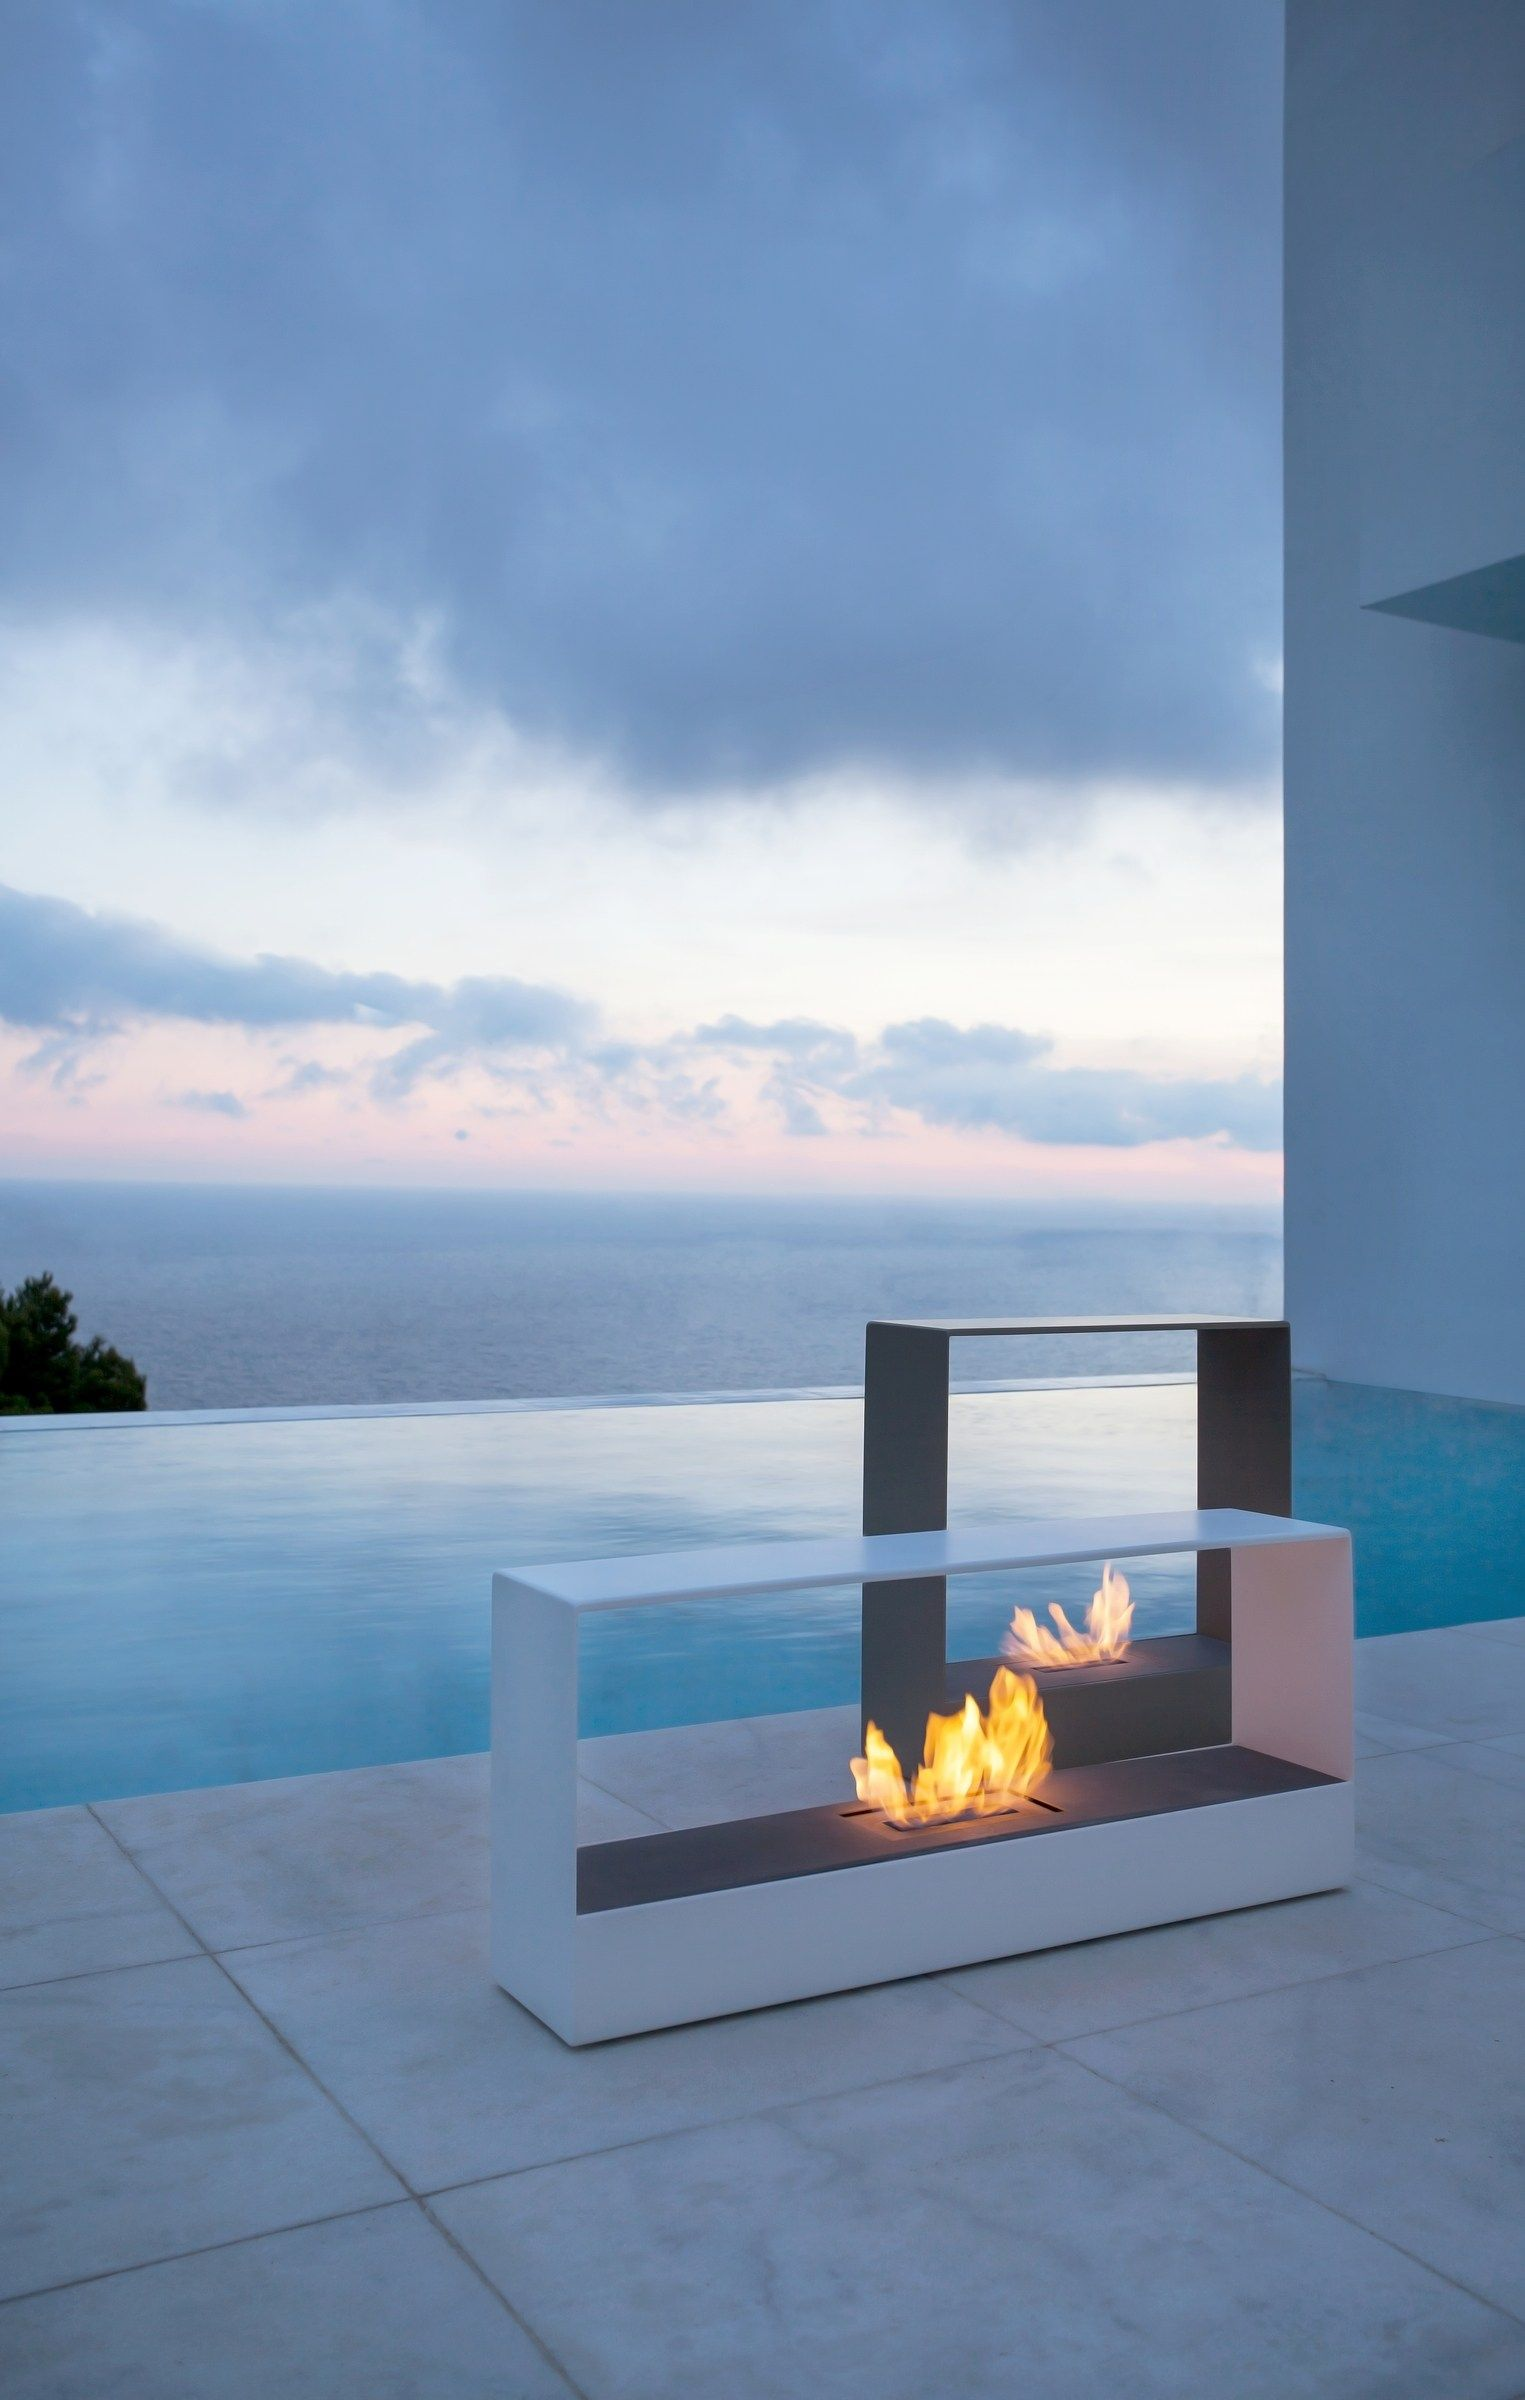 Outdoor Bioethanol Fireplace Llar By Gandia Blasco Design Borja Garcia Outdoor Fire Outdoor Fire Pit Outdoor Kitchen Design